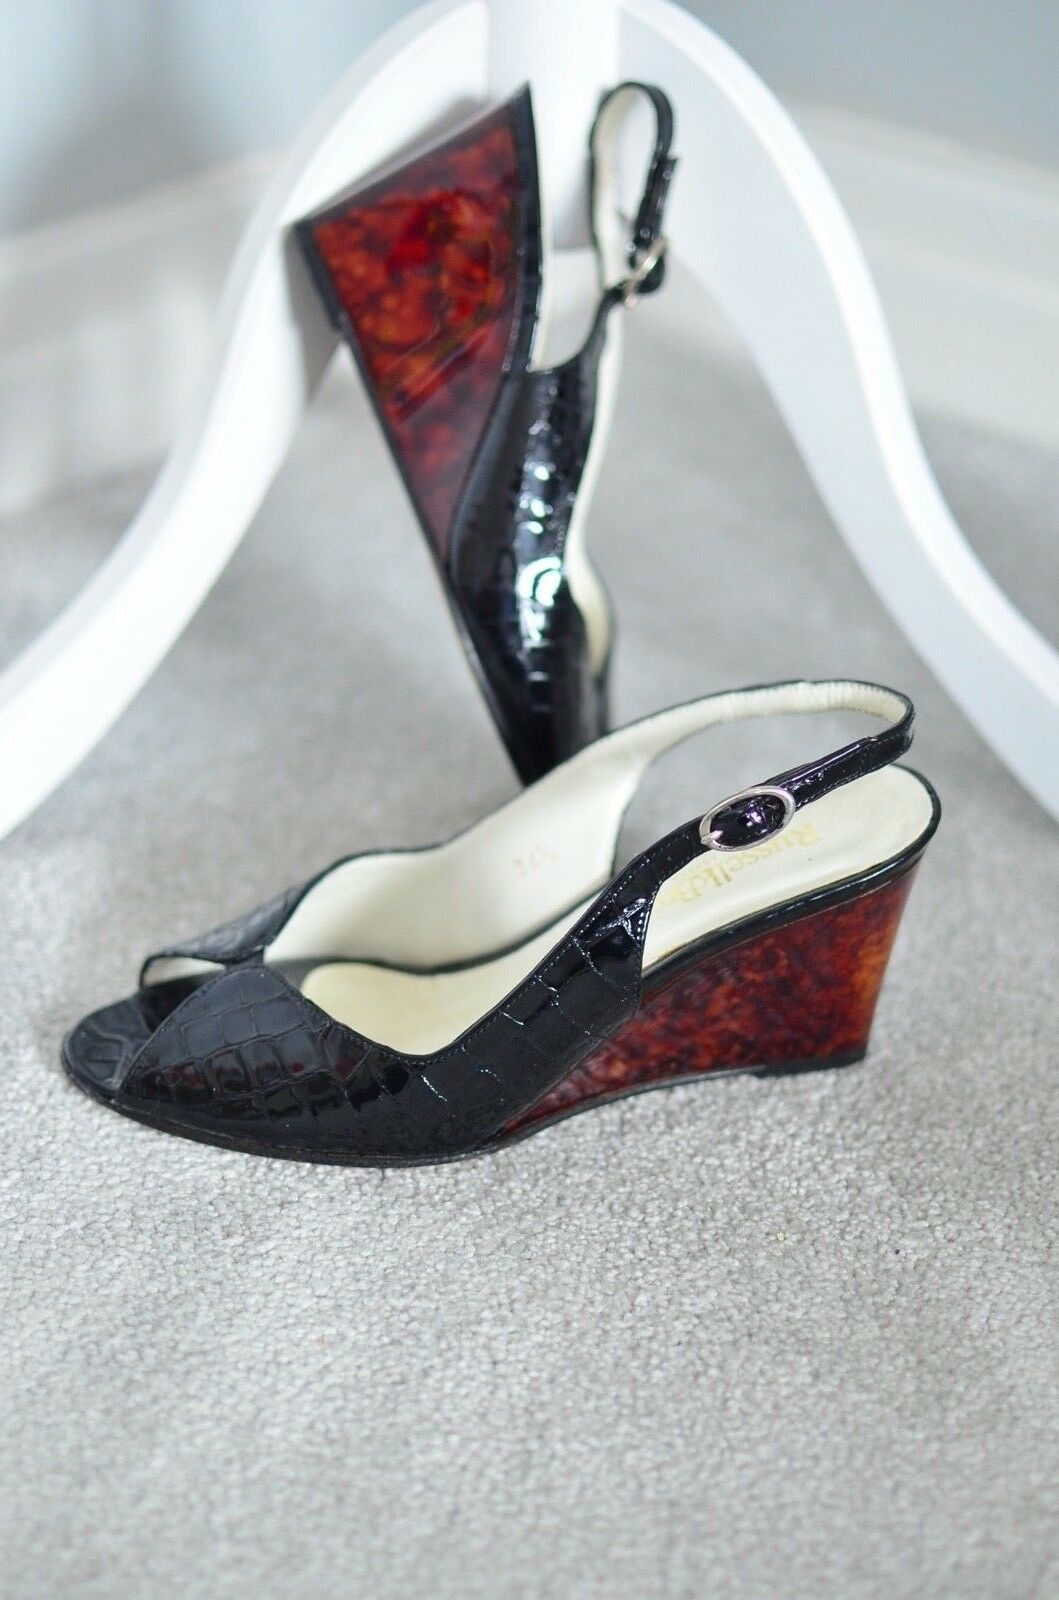 RUSSELL & BROMLEY Patent croc print tortoiseshell wedge peep toe heels 36.5 3.5